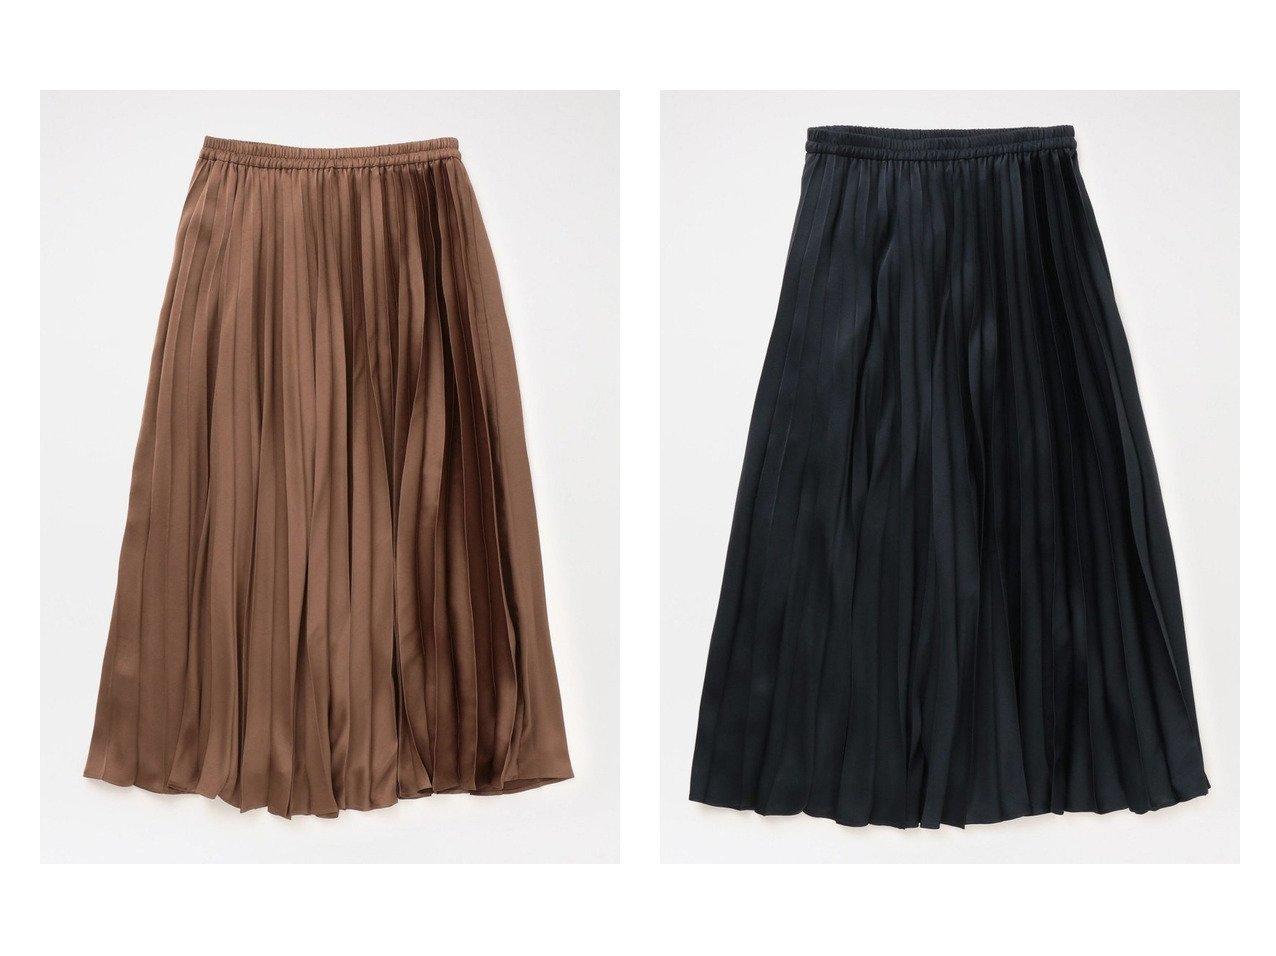 【LOVELESS/ラブレス】の【LOVELESS×otona MUSE】リバーシブル プリーツスカート スカートのおすすめ!人気、レディースファッションの通販 おすすめファッション通販アイテム インテリア・キッズ・メンズ・レディースファッション・服の通販 founy(ファニー) ファッション Fashion レディース WOMEN スカート Skirt プリーツスカート Pleated Skirts ロングスカート Long Skirt エレガント オーガンジー サテン シンプル トレンド ドレス フェミニン プリーツ ベーシック リバーシブル ロング 人気 雑誌 ブラウン系 Brown ブルー系 Blue |ID:crp329100000004917